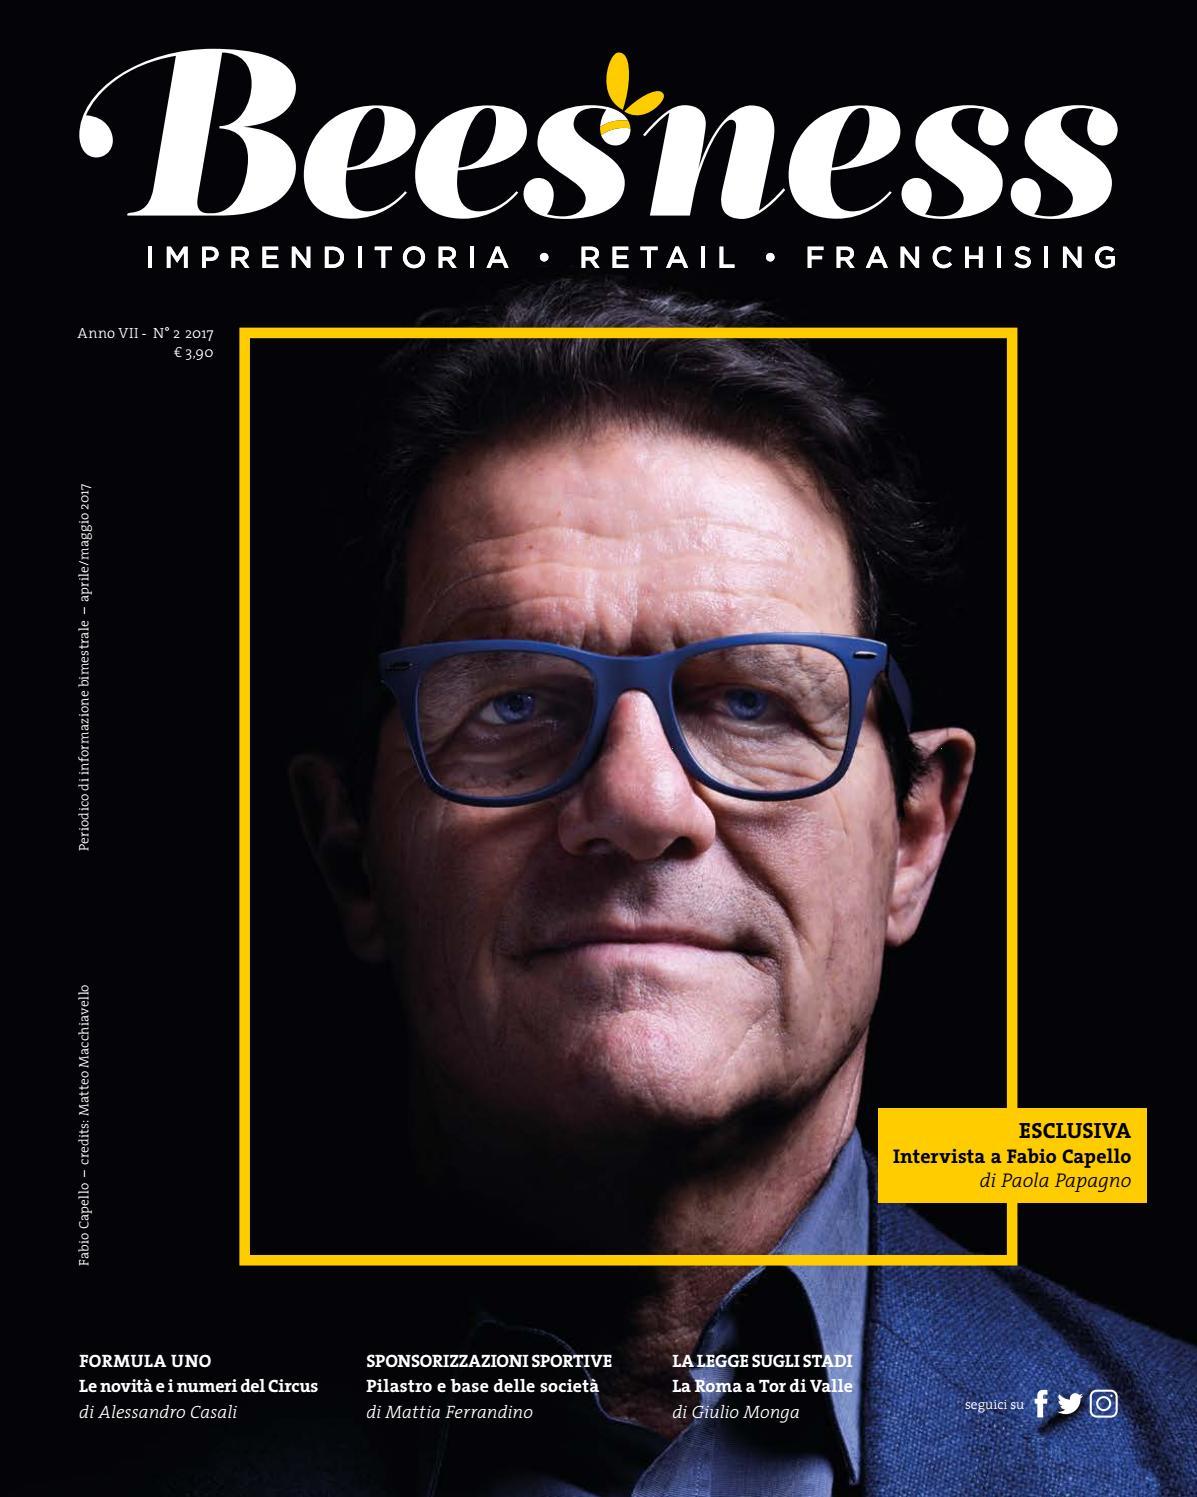 Beesness - Fabio Capello by Beesness - issuu 9244e495d63